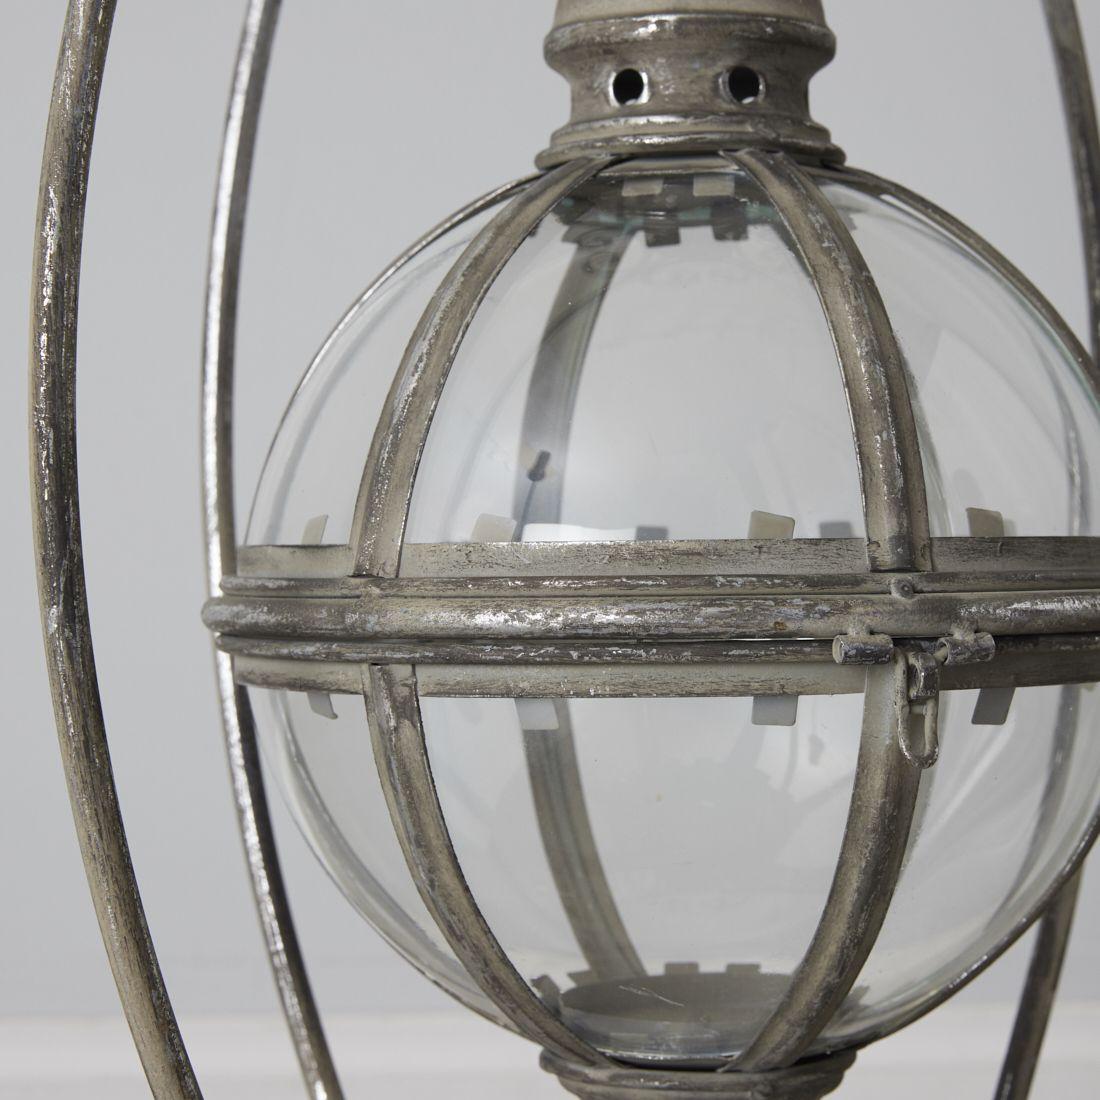 Orb lantern